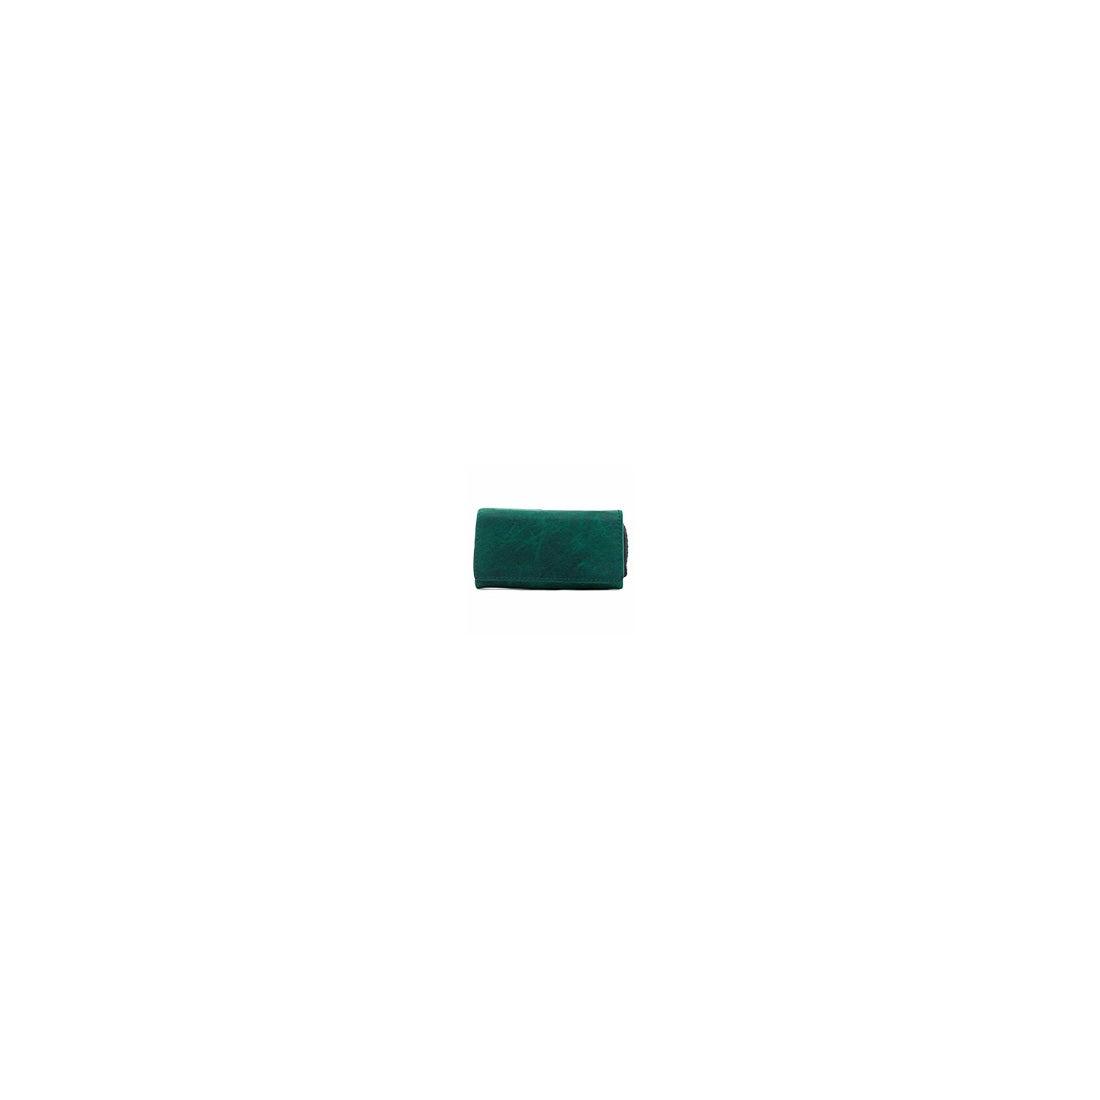 【SAC'S BAR】SOLATINA ソラチナ キーケース 38154 焦げ加工ホースレザー キーケース 全4色 GREEN メンズ